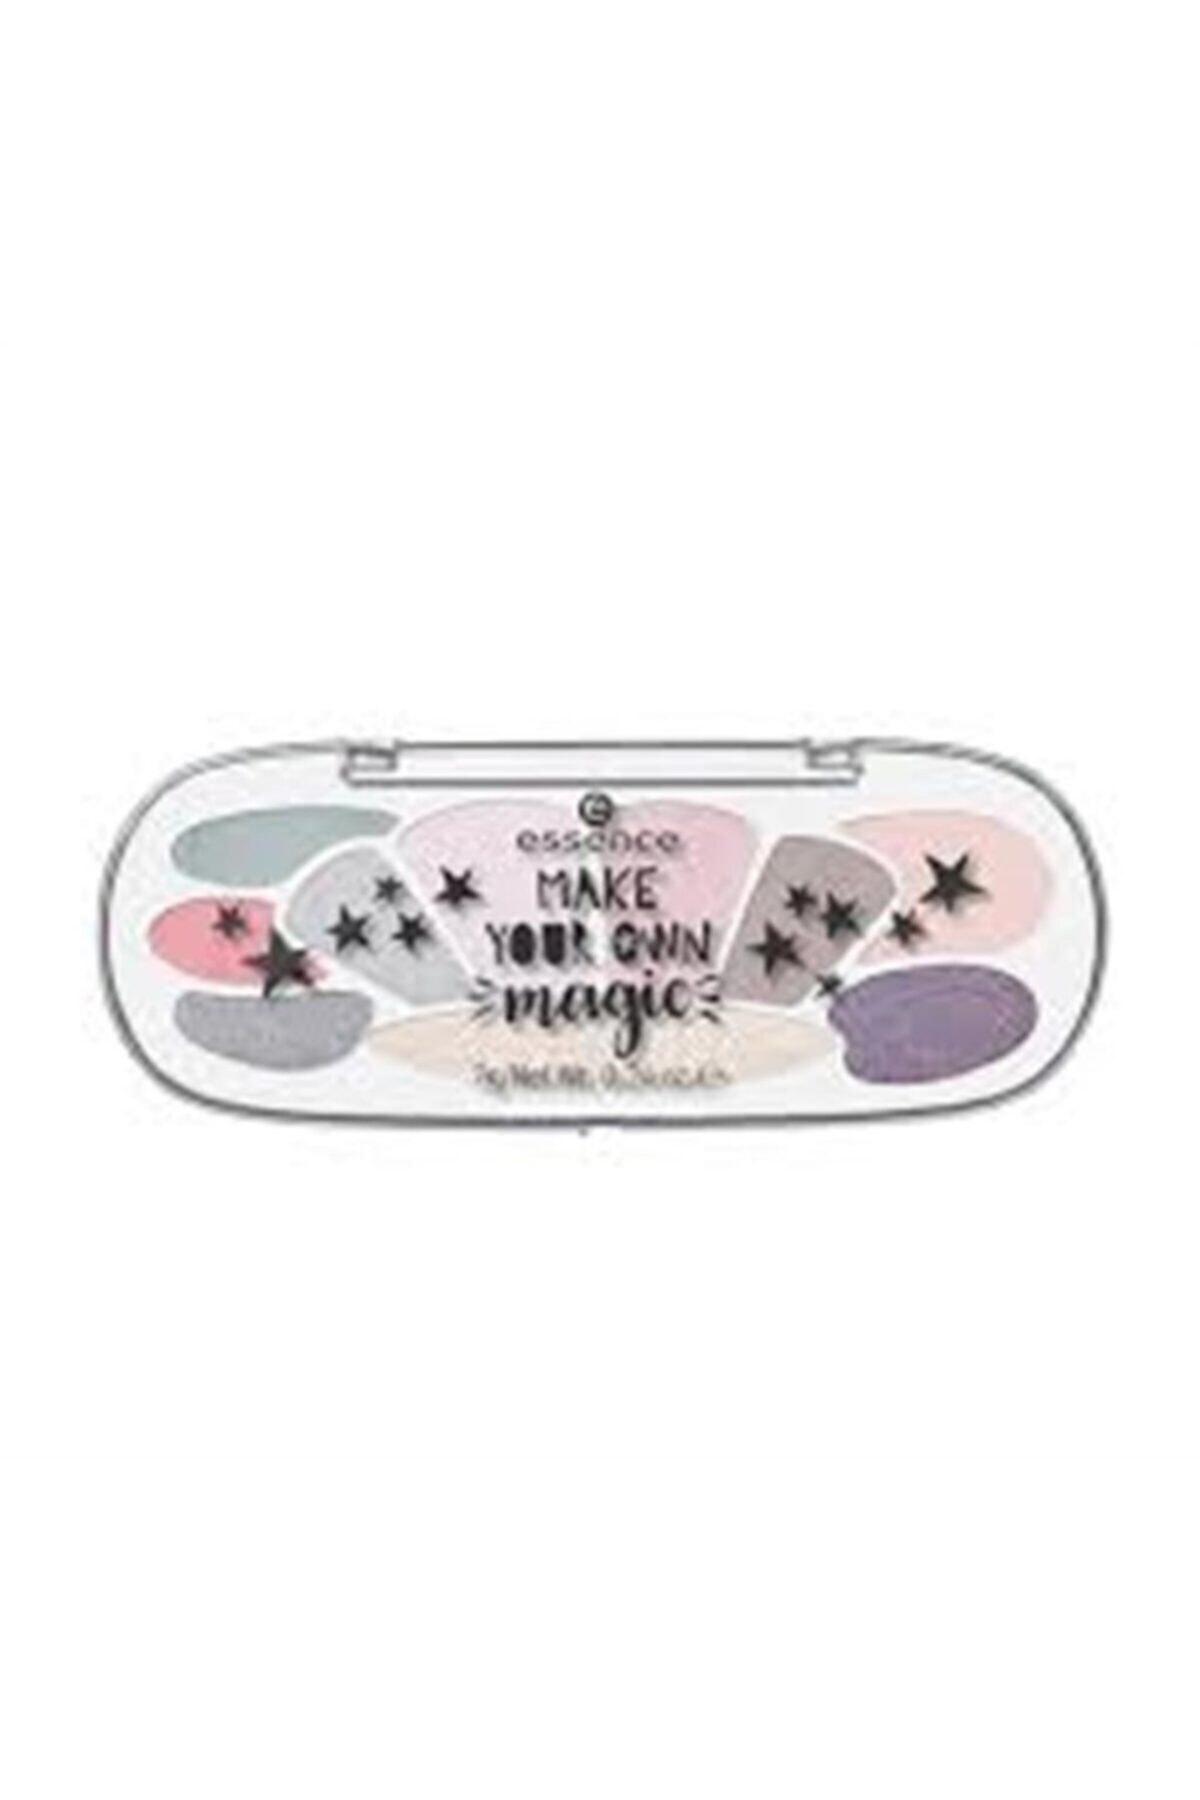 Essence Make Your Own Magic Eyeshadow Box Palet Göz Farı 06 2